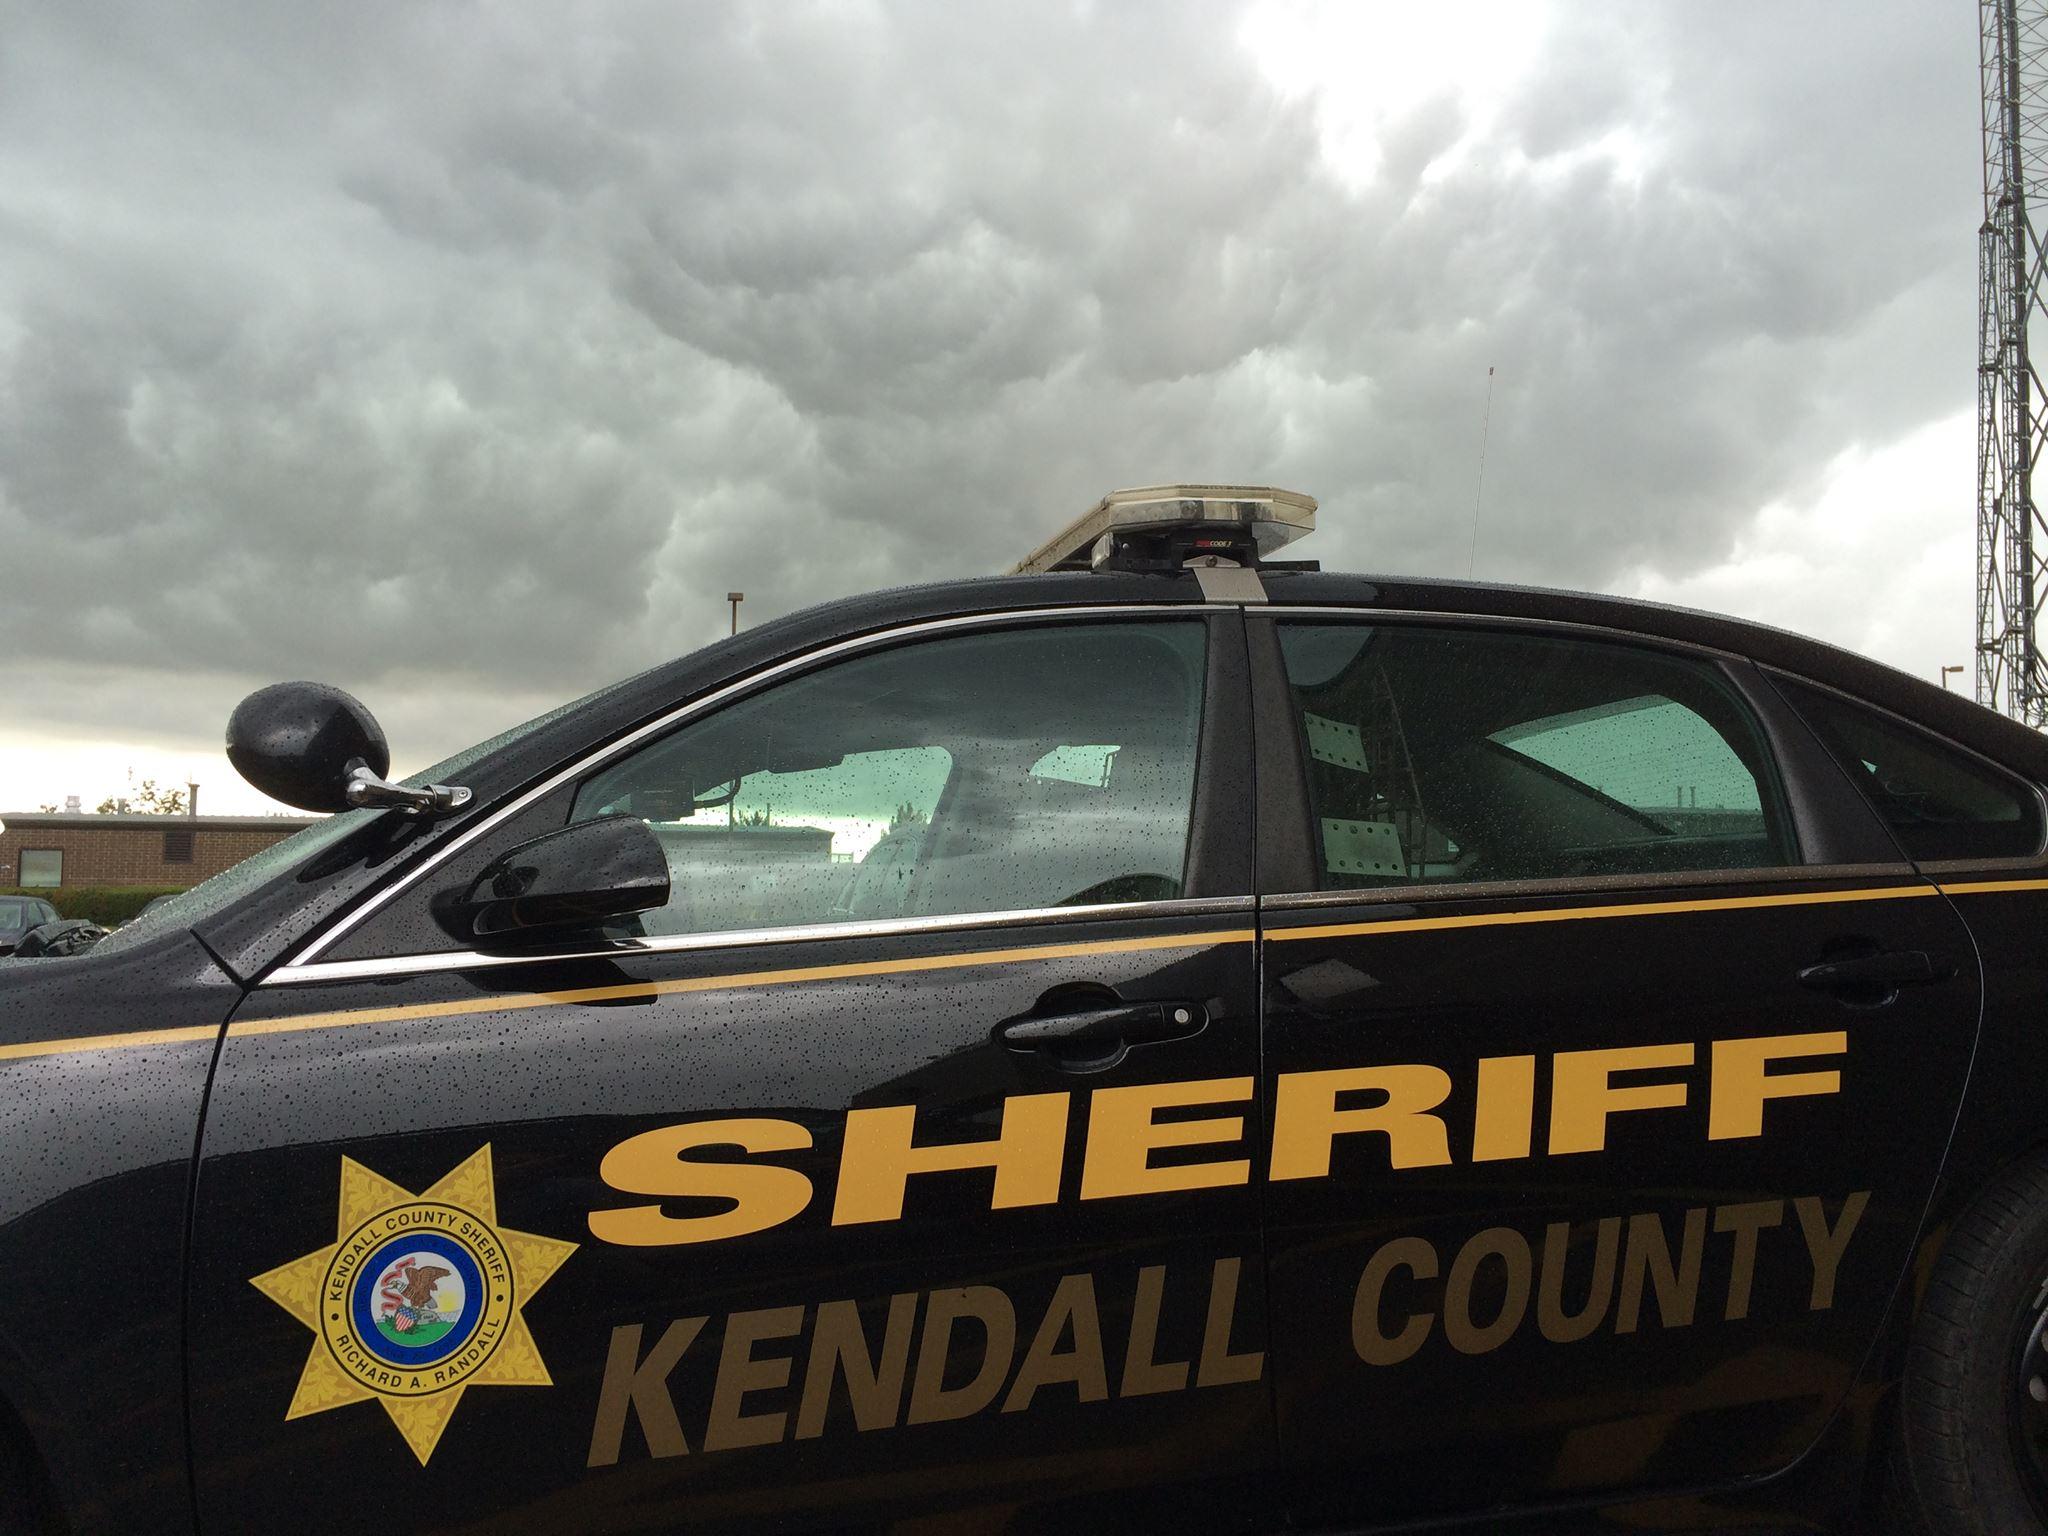 Illinois kendall county oswego - Kendall County Ill Patrol Car